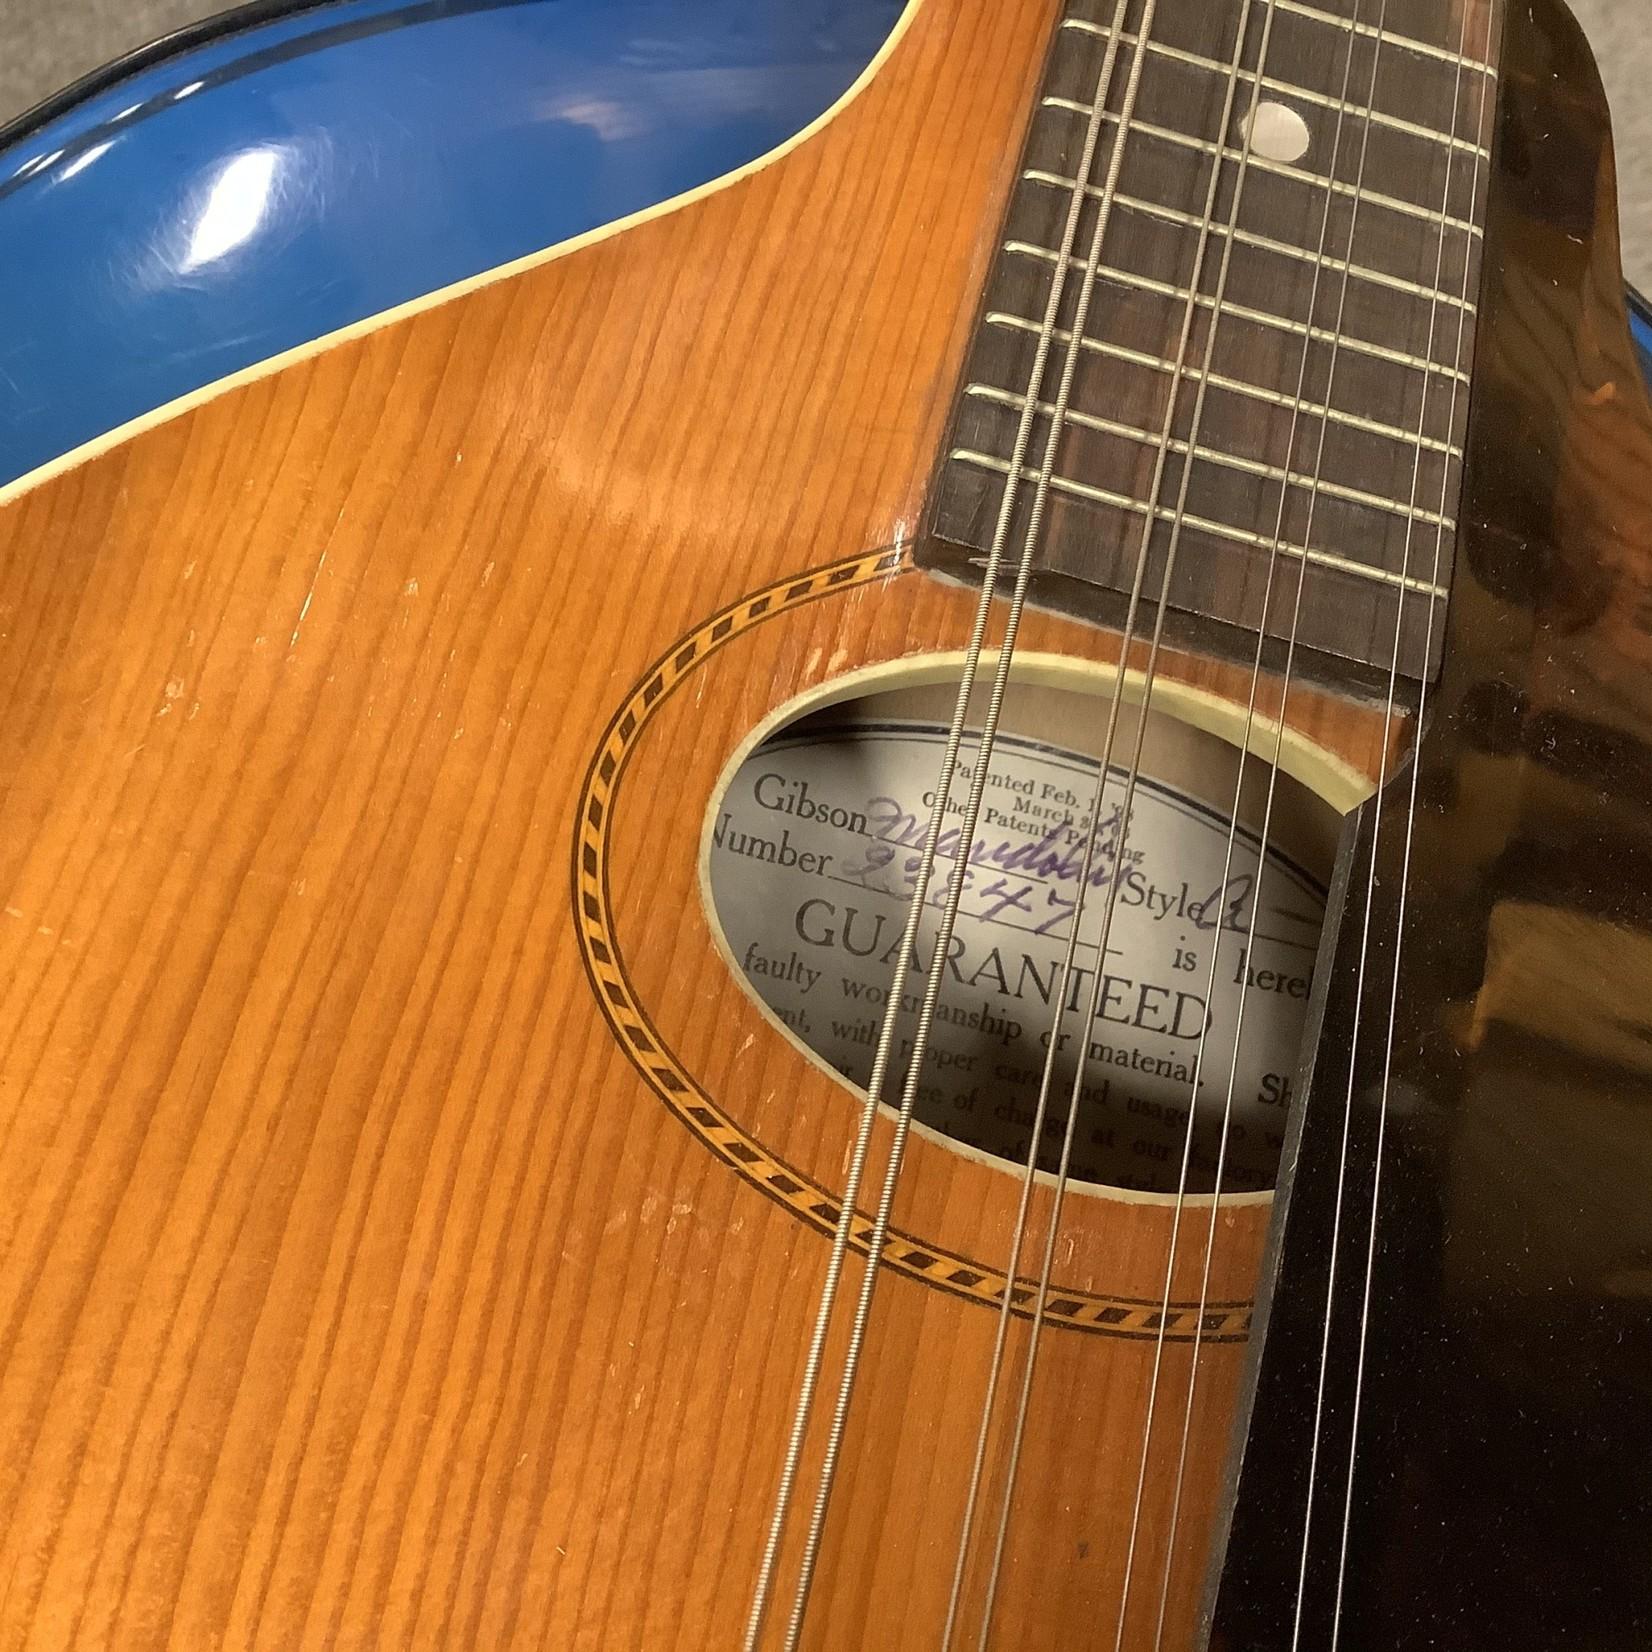 Gibson 1915 Gibson Style A Mandolin